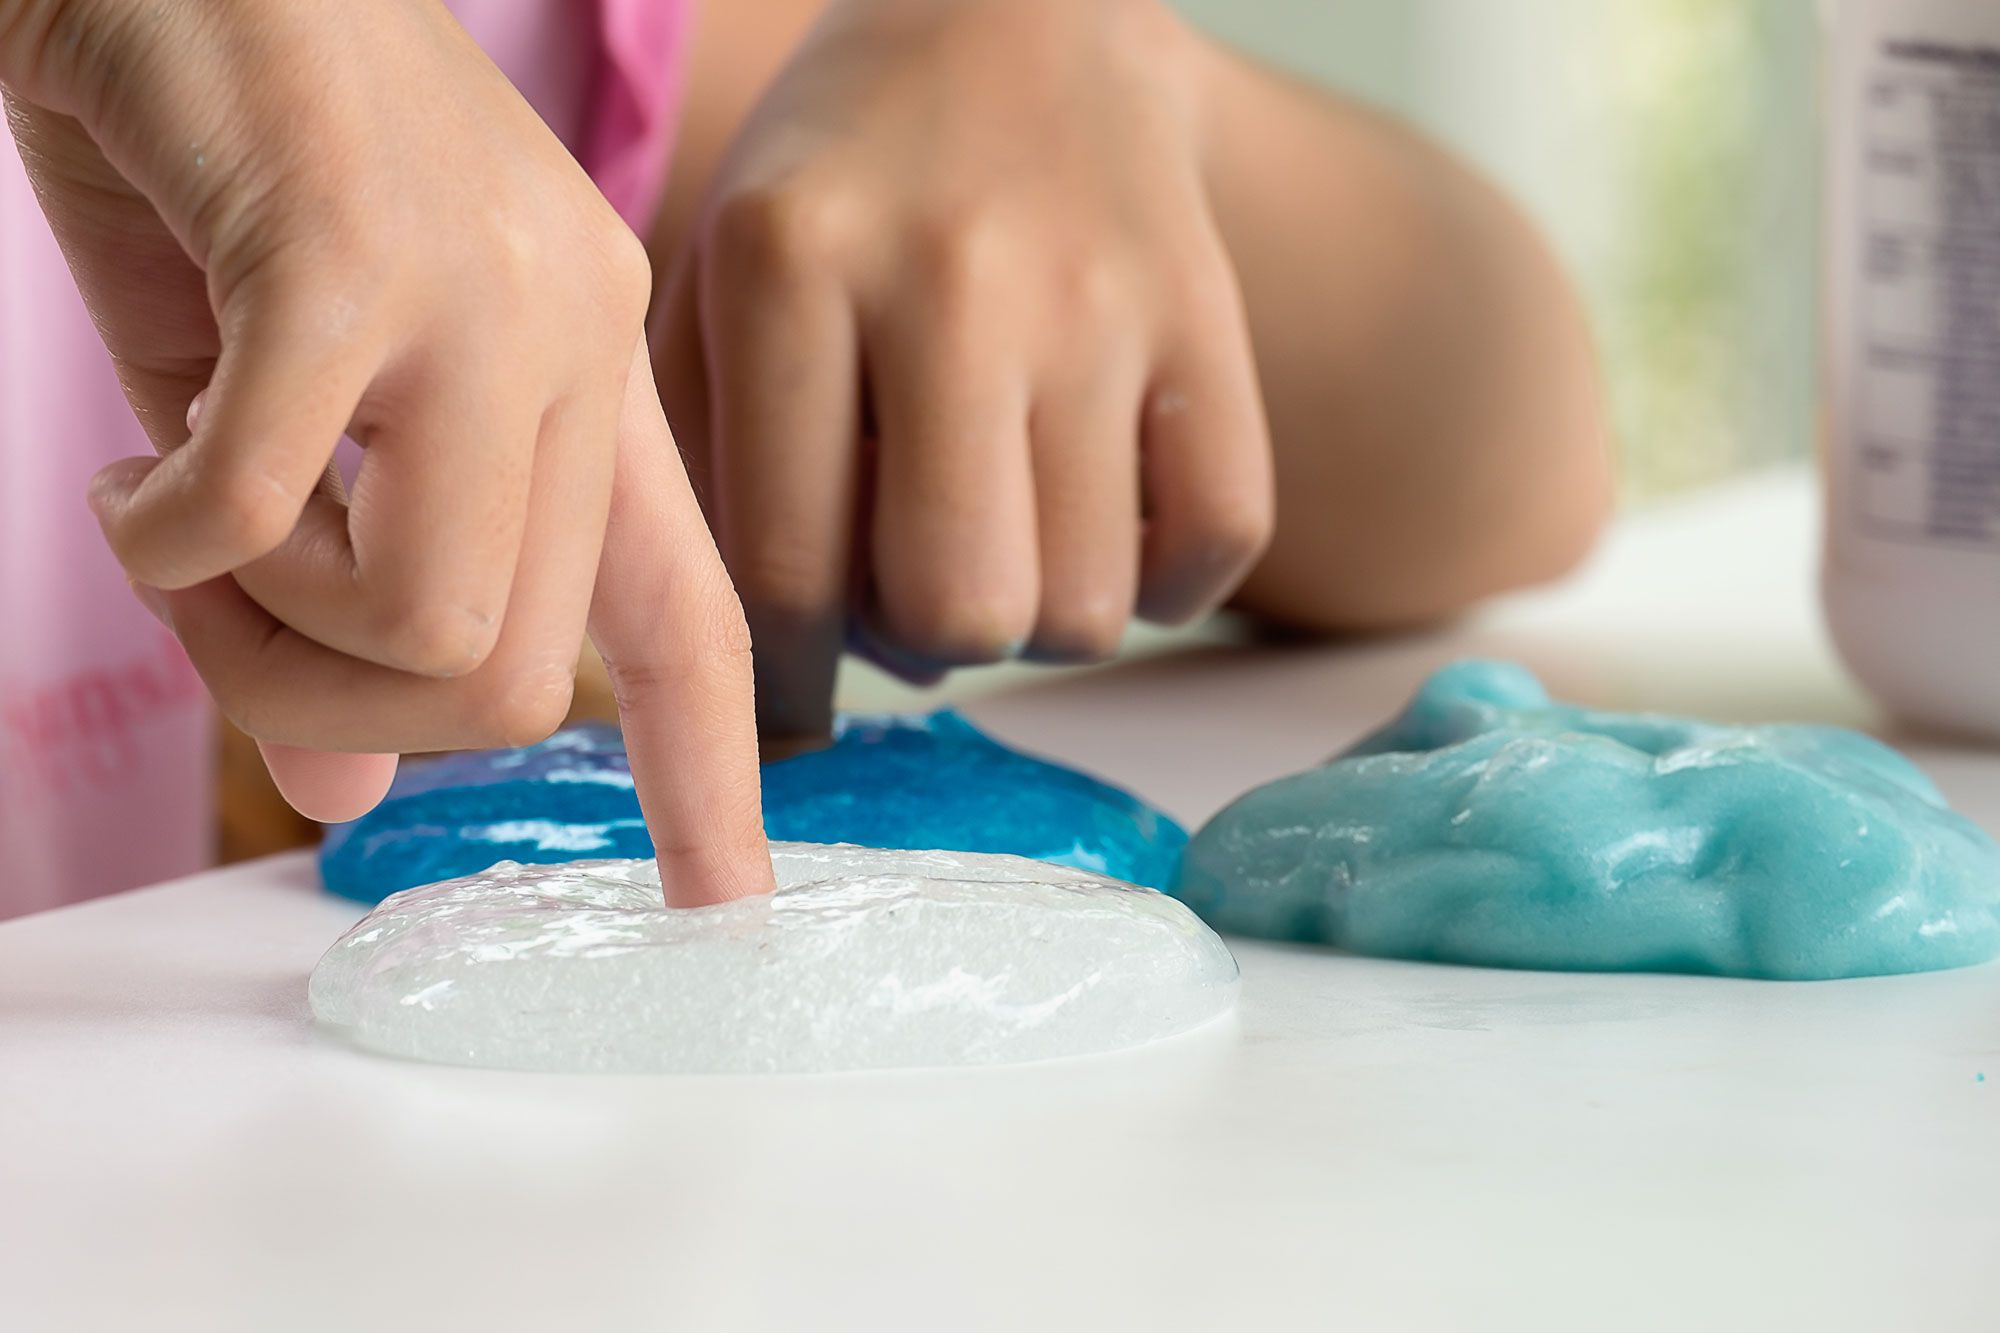 Aprende a preparar Slime casero con maicena